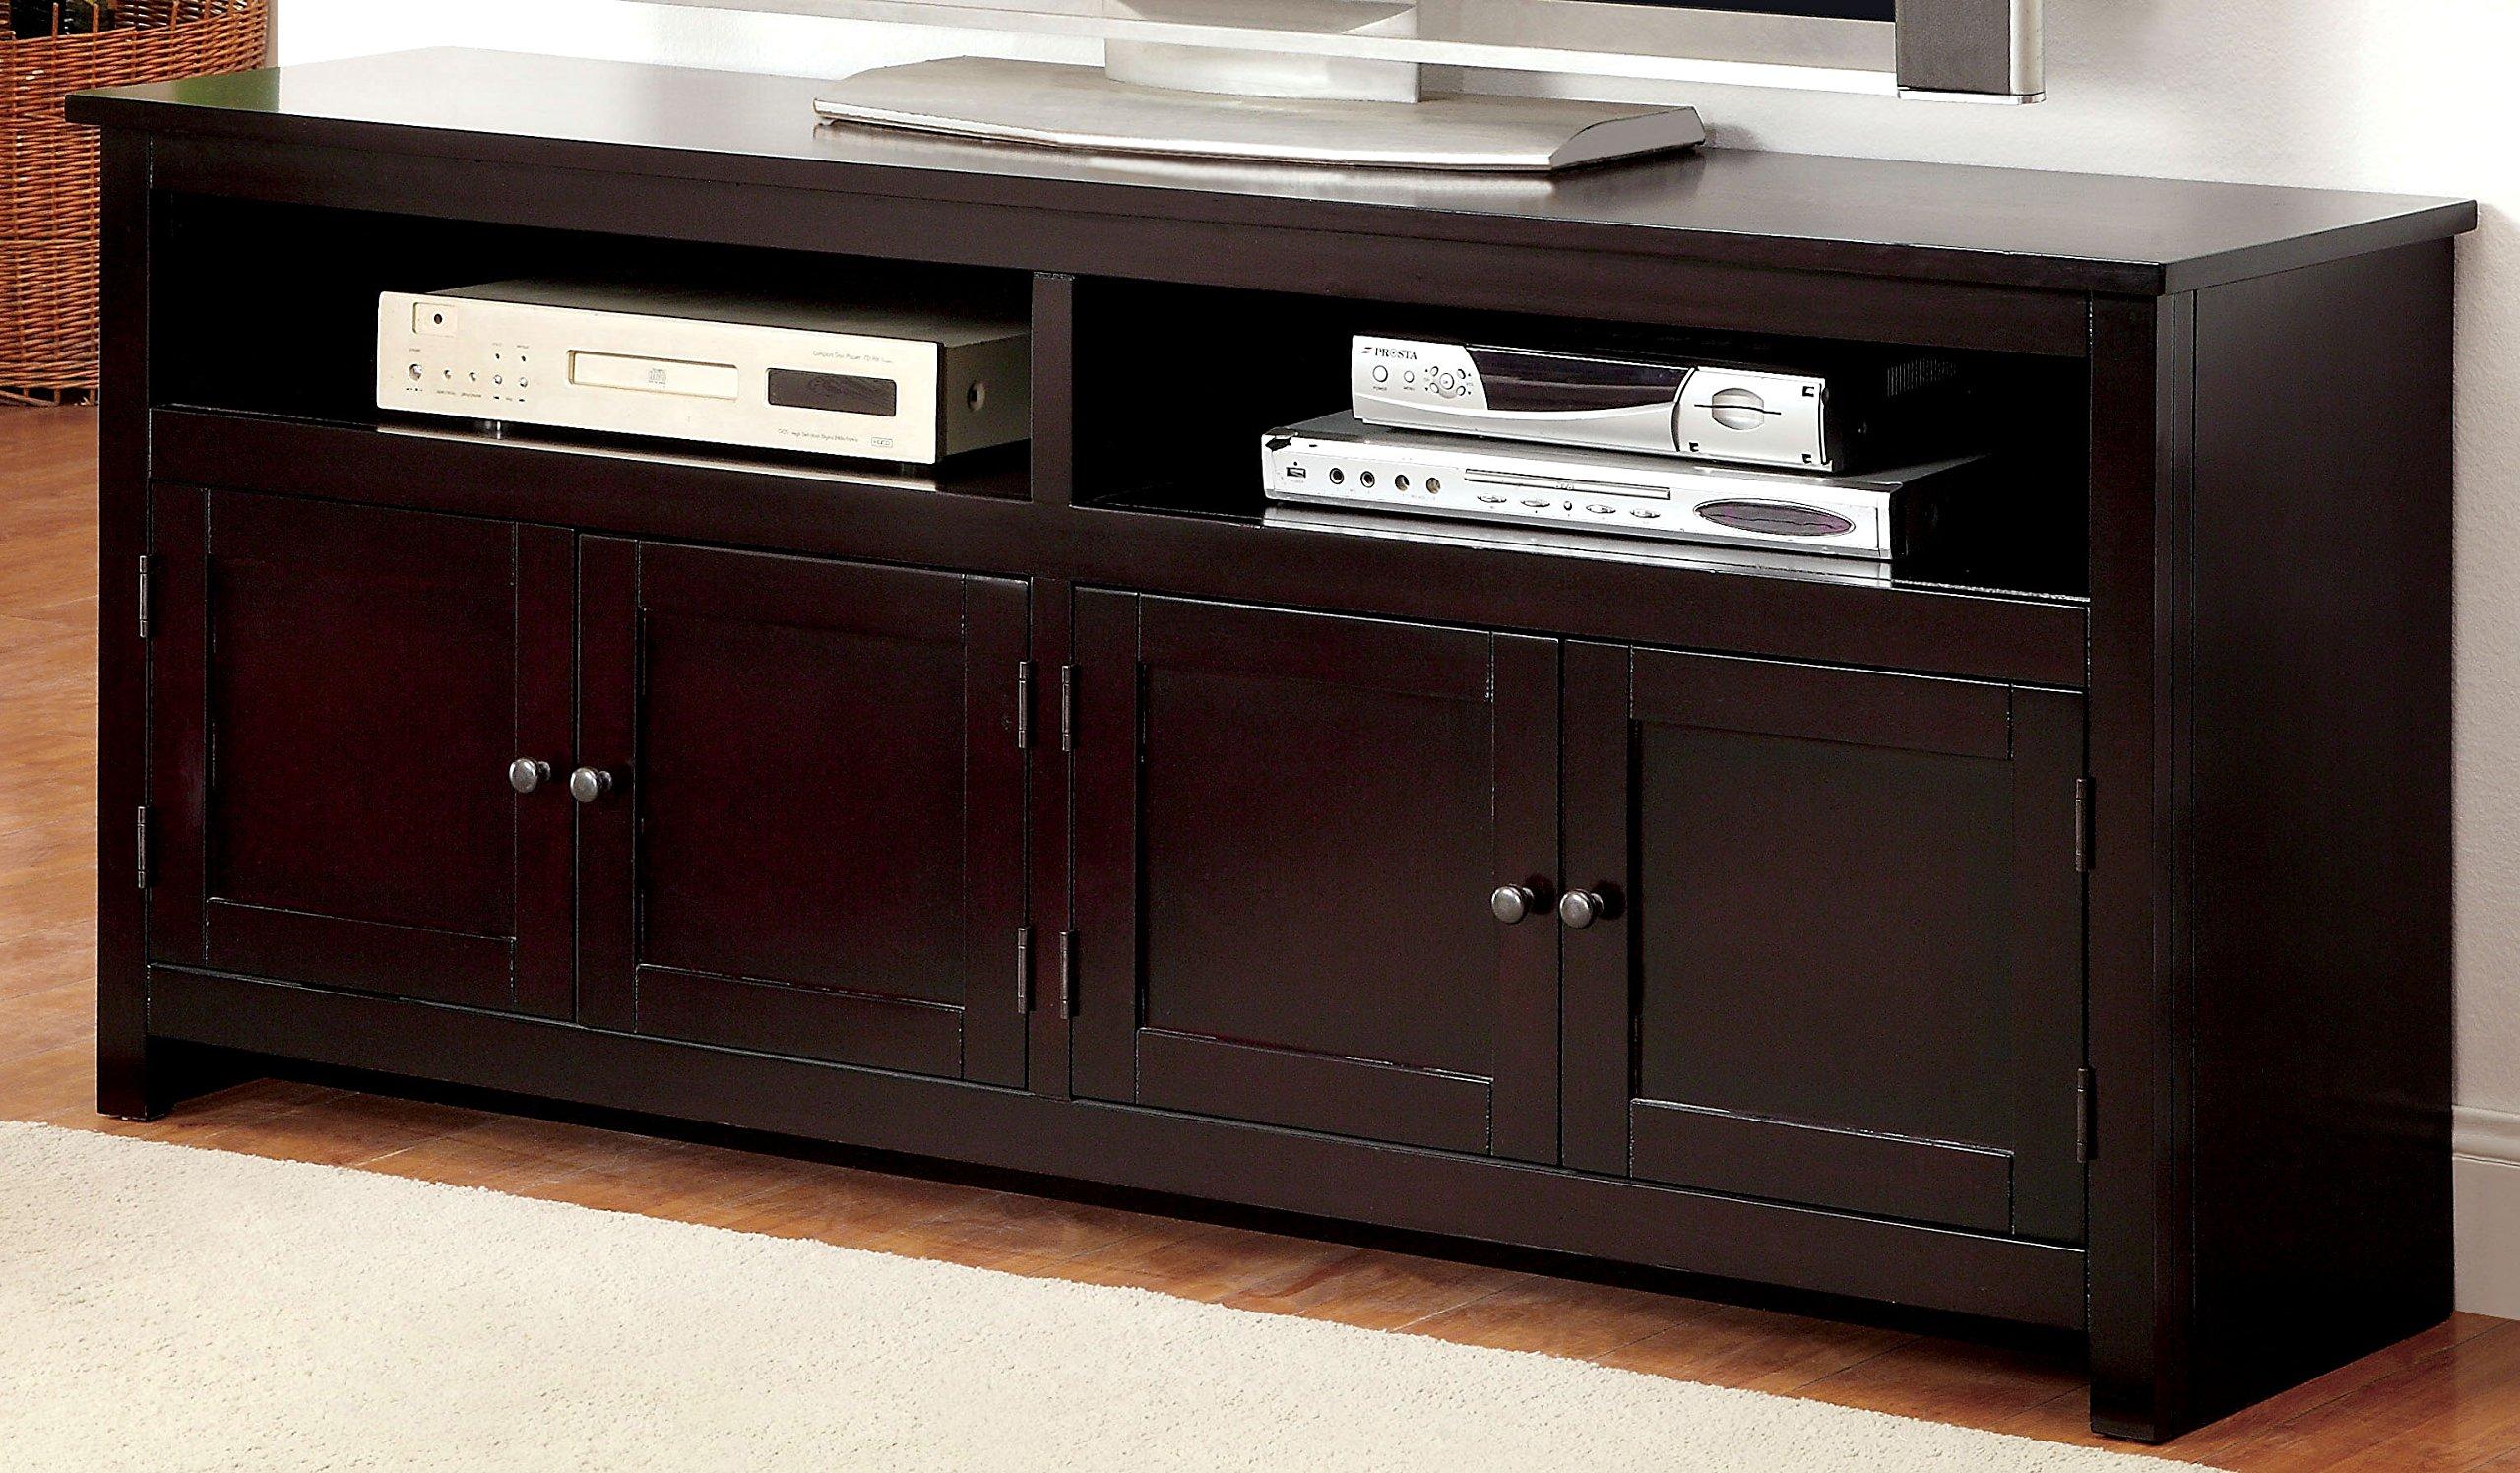 Furniture of America Merina Transitional TV Console, 60-Inch, Espresso